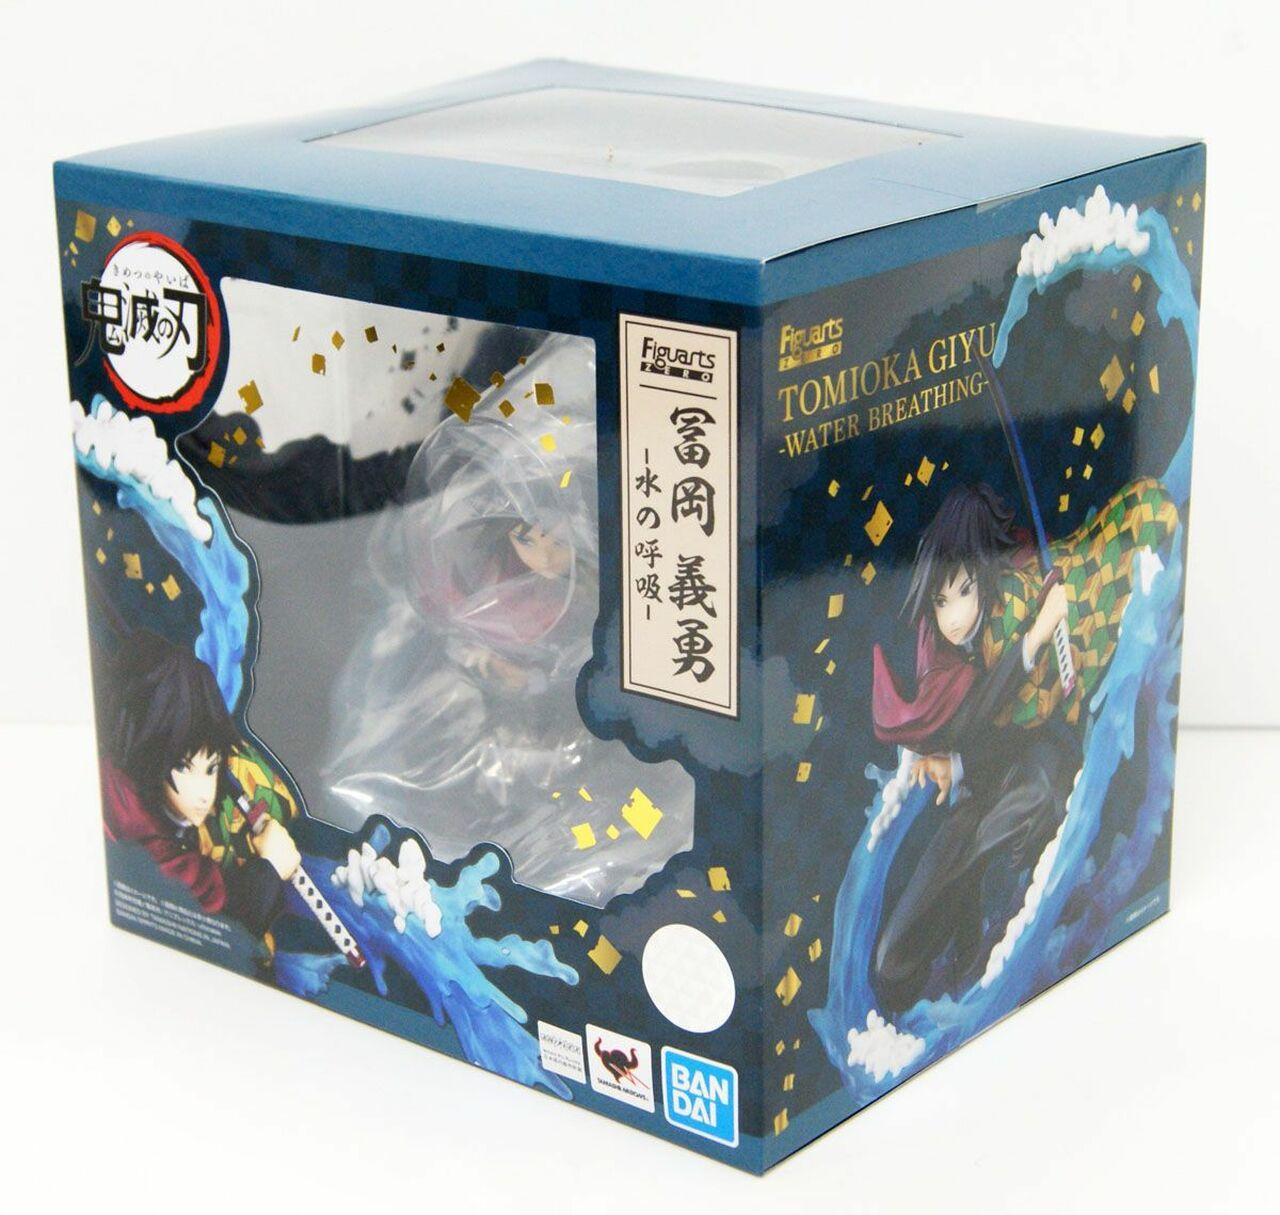 "Bandai Spirits Figuarts Zero Tomioka Giyu -Water Breathing ""Demon Slayer"""